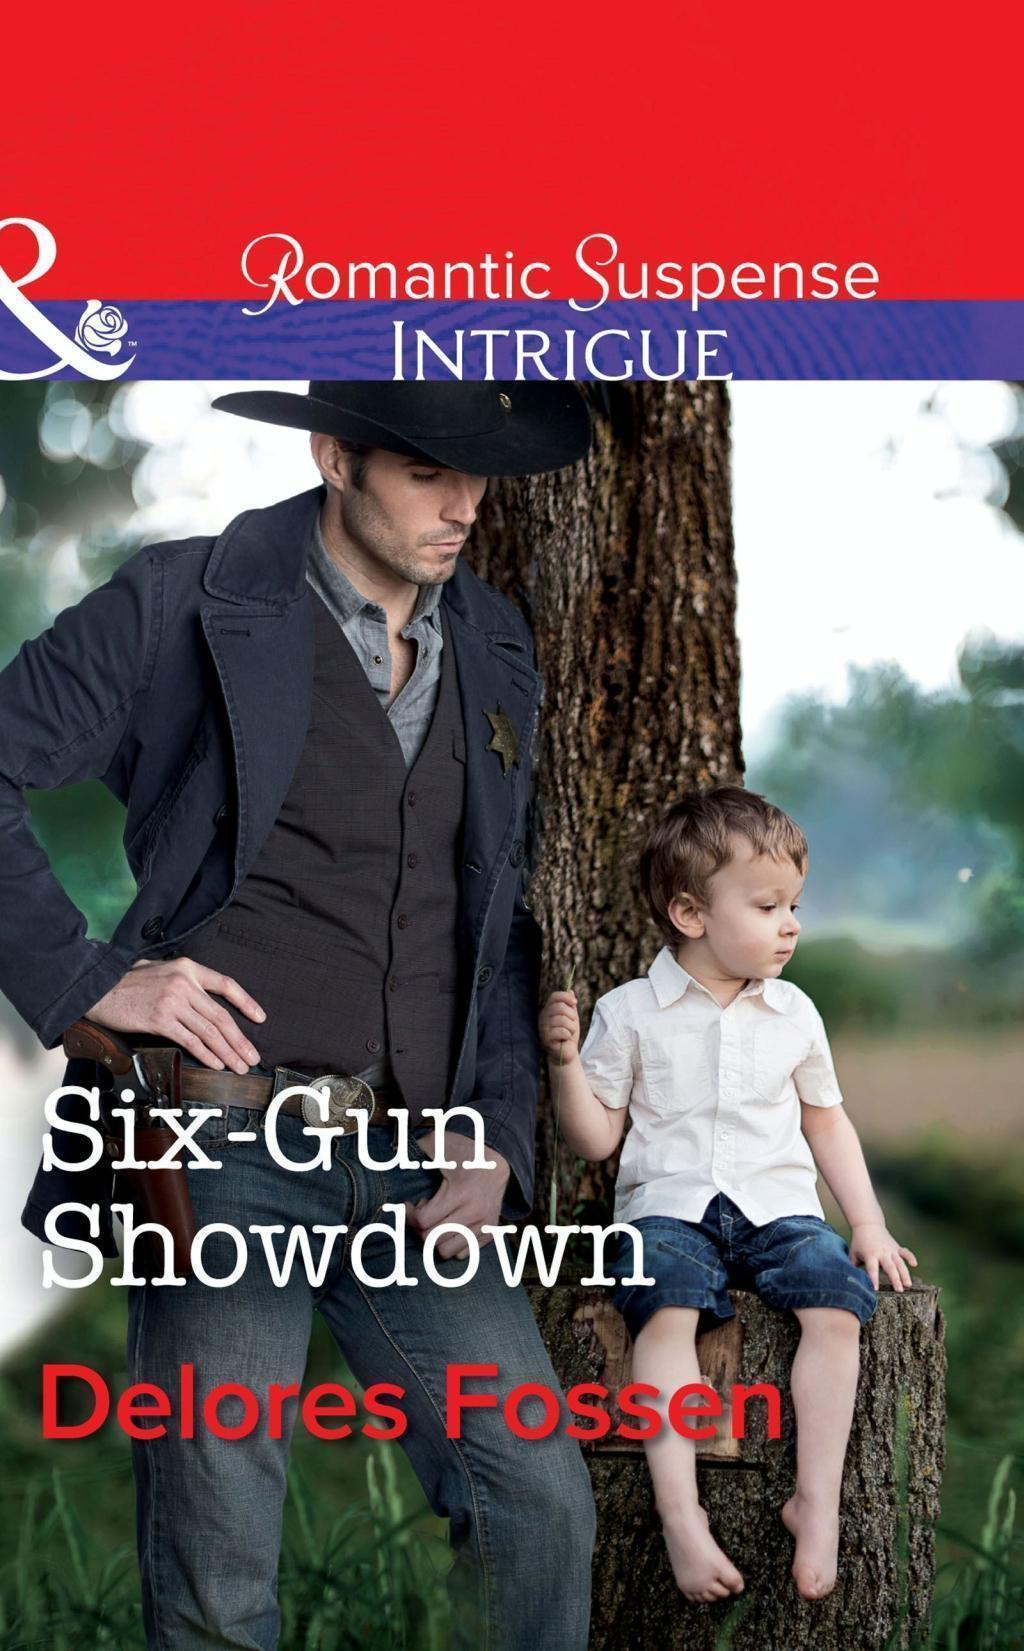 Six-Gun Showdown (Mills & Boon Intrigue) (Appaloosa Pass Ranch, Book 5)